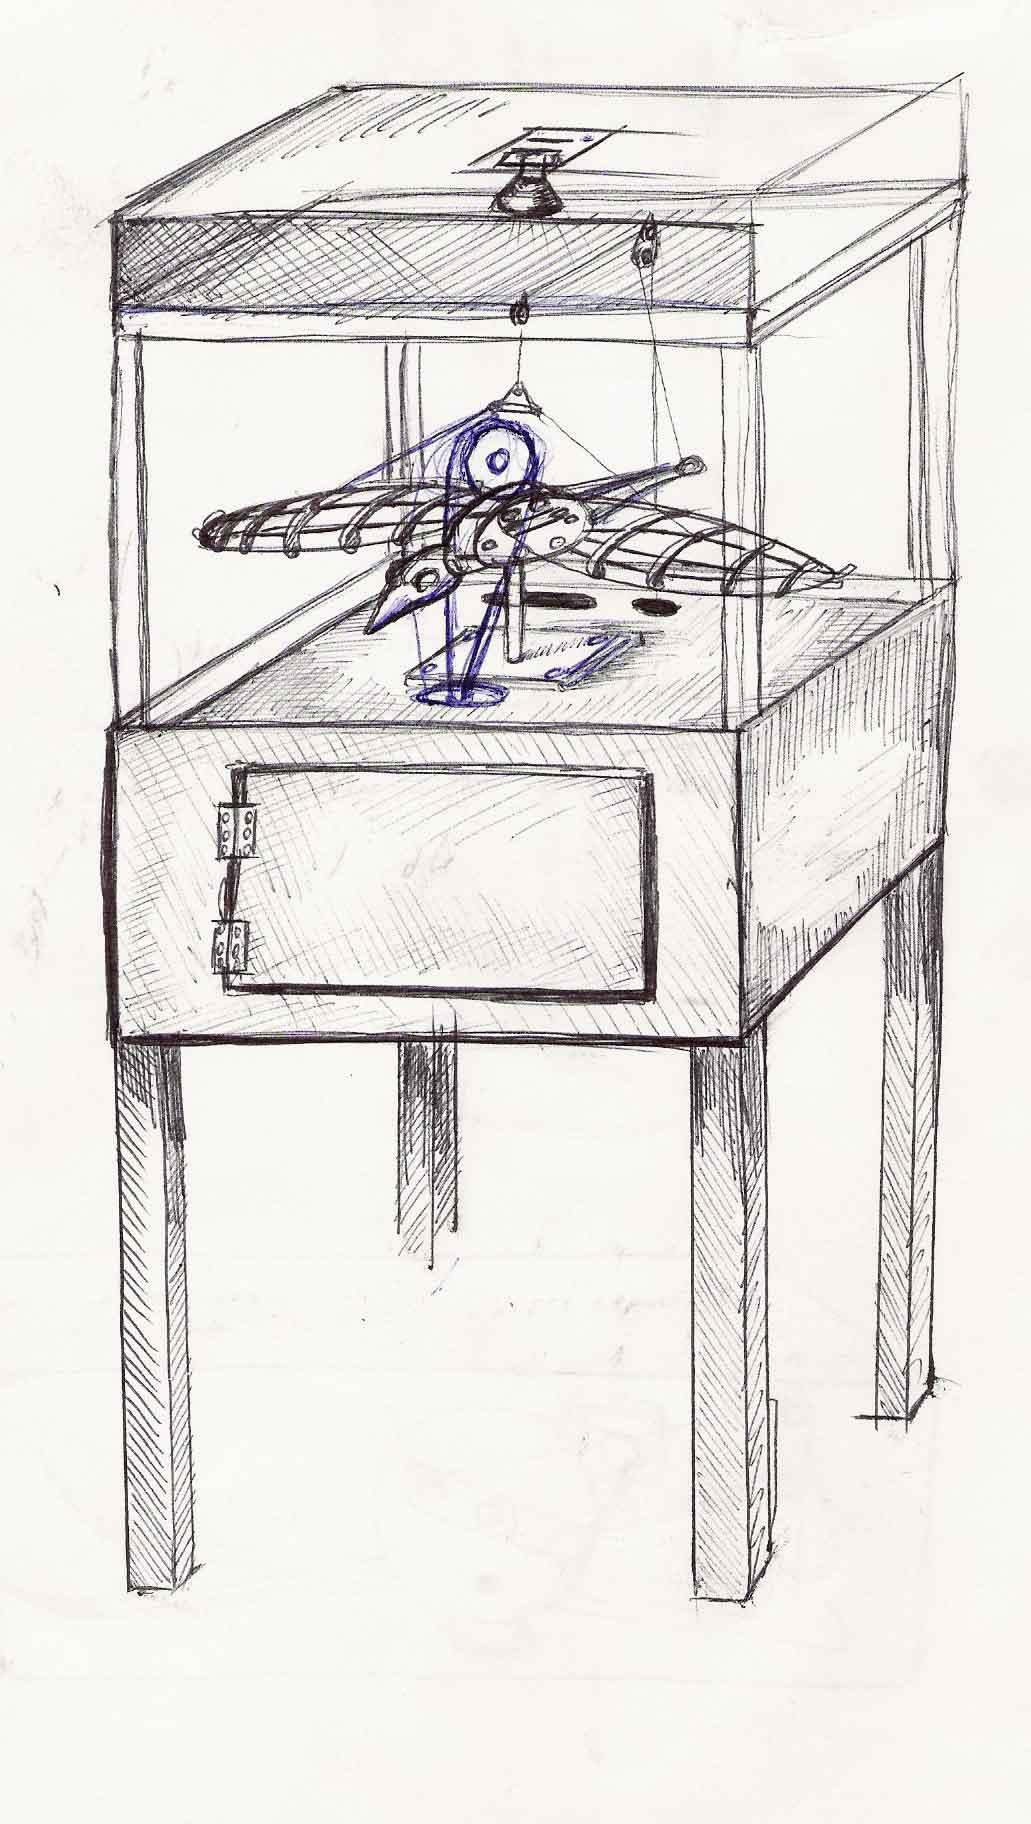 sketch-27-sept-05.jpg